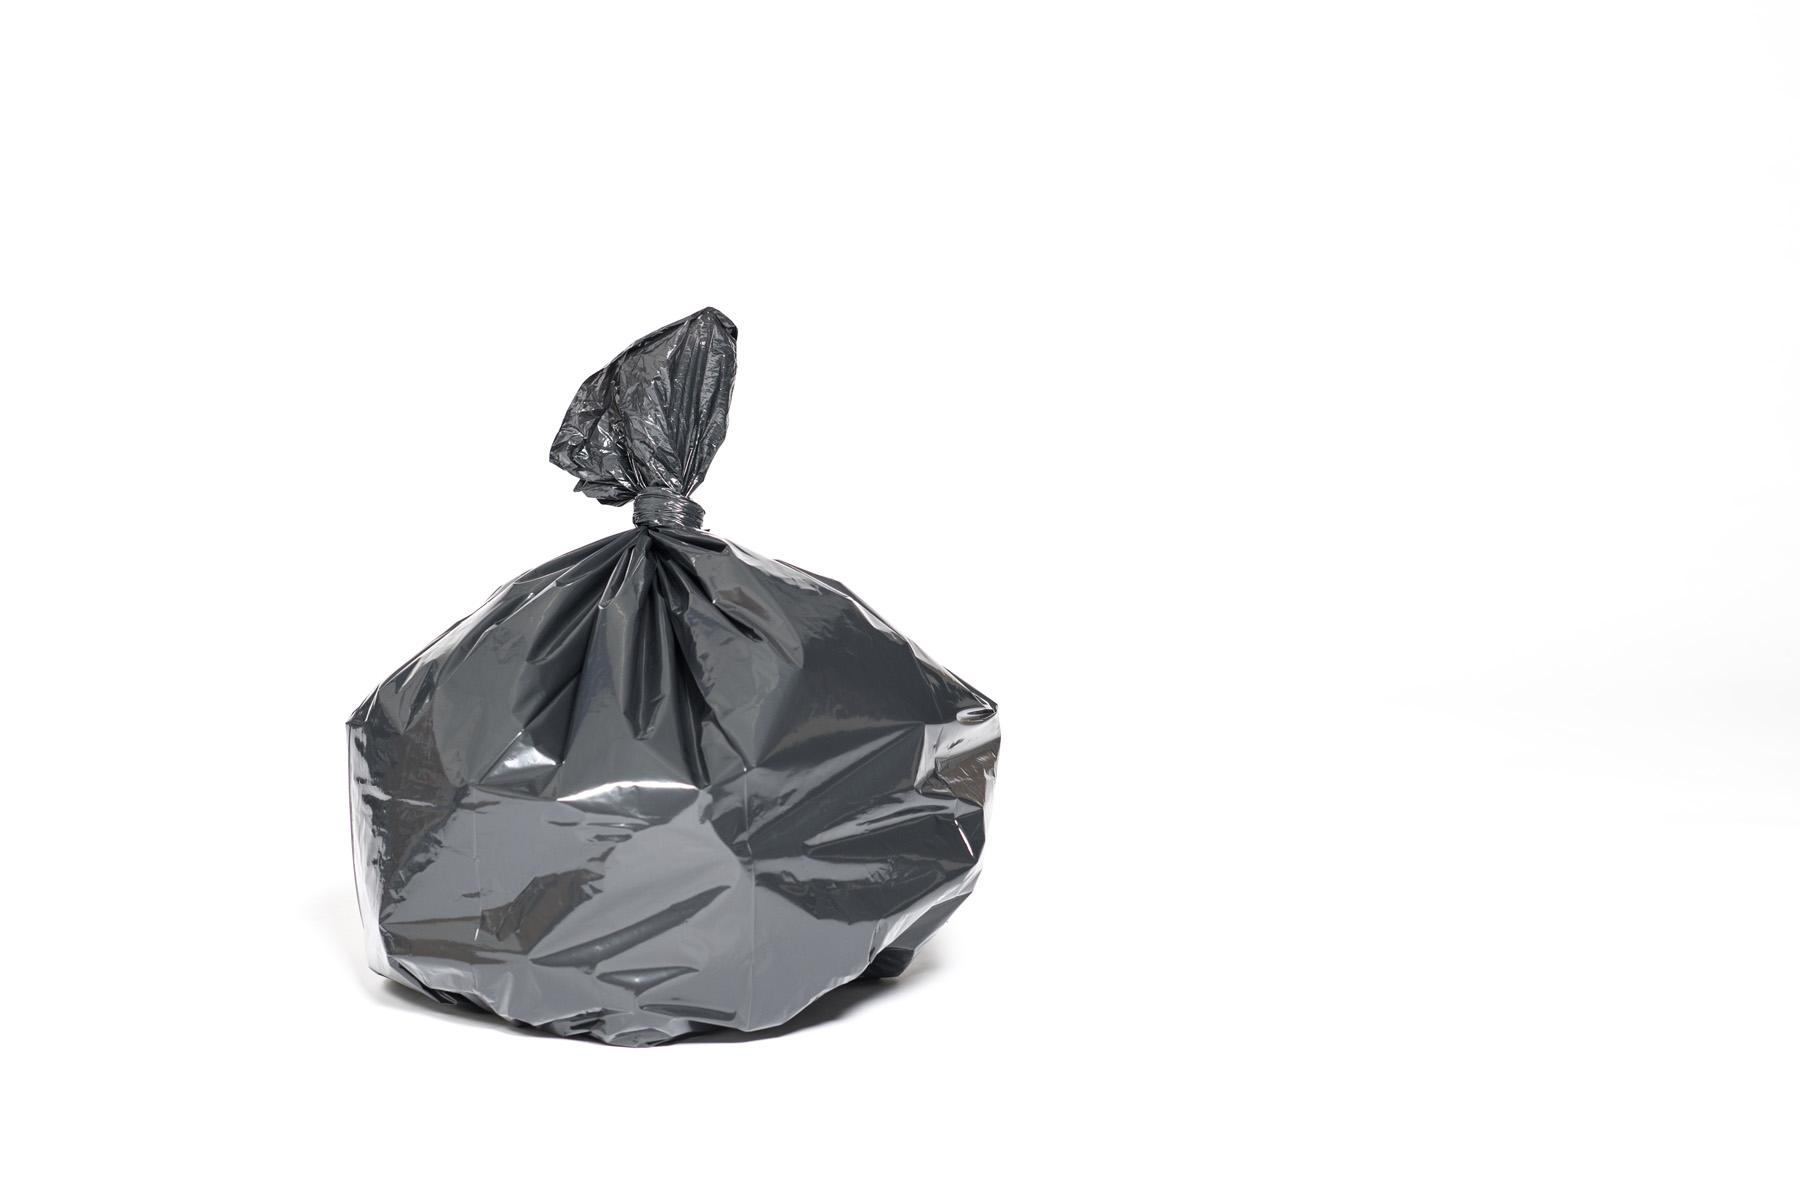 Bag of Rubbish